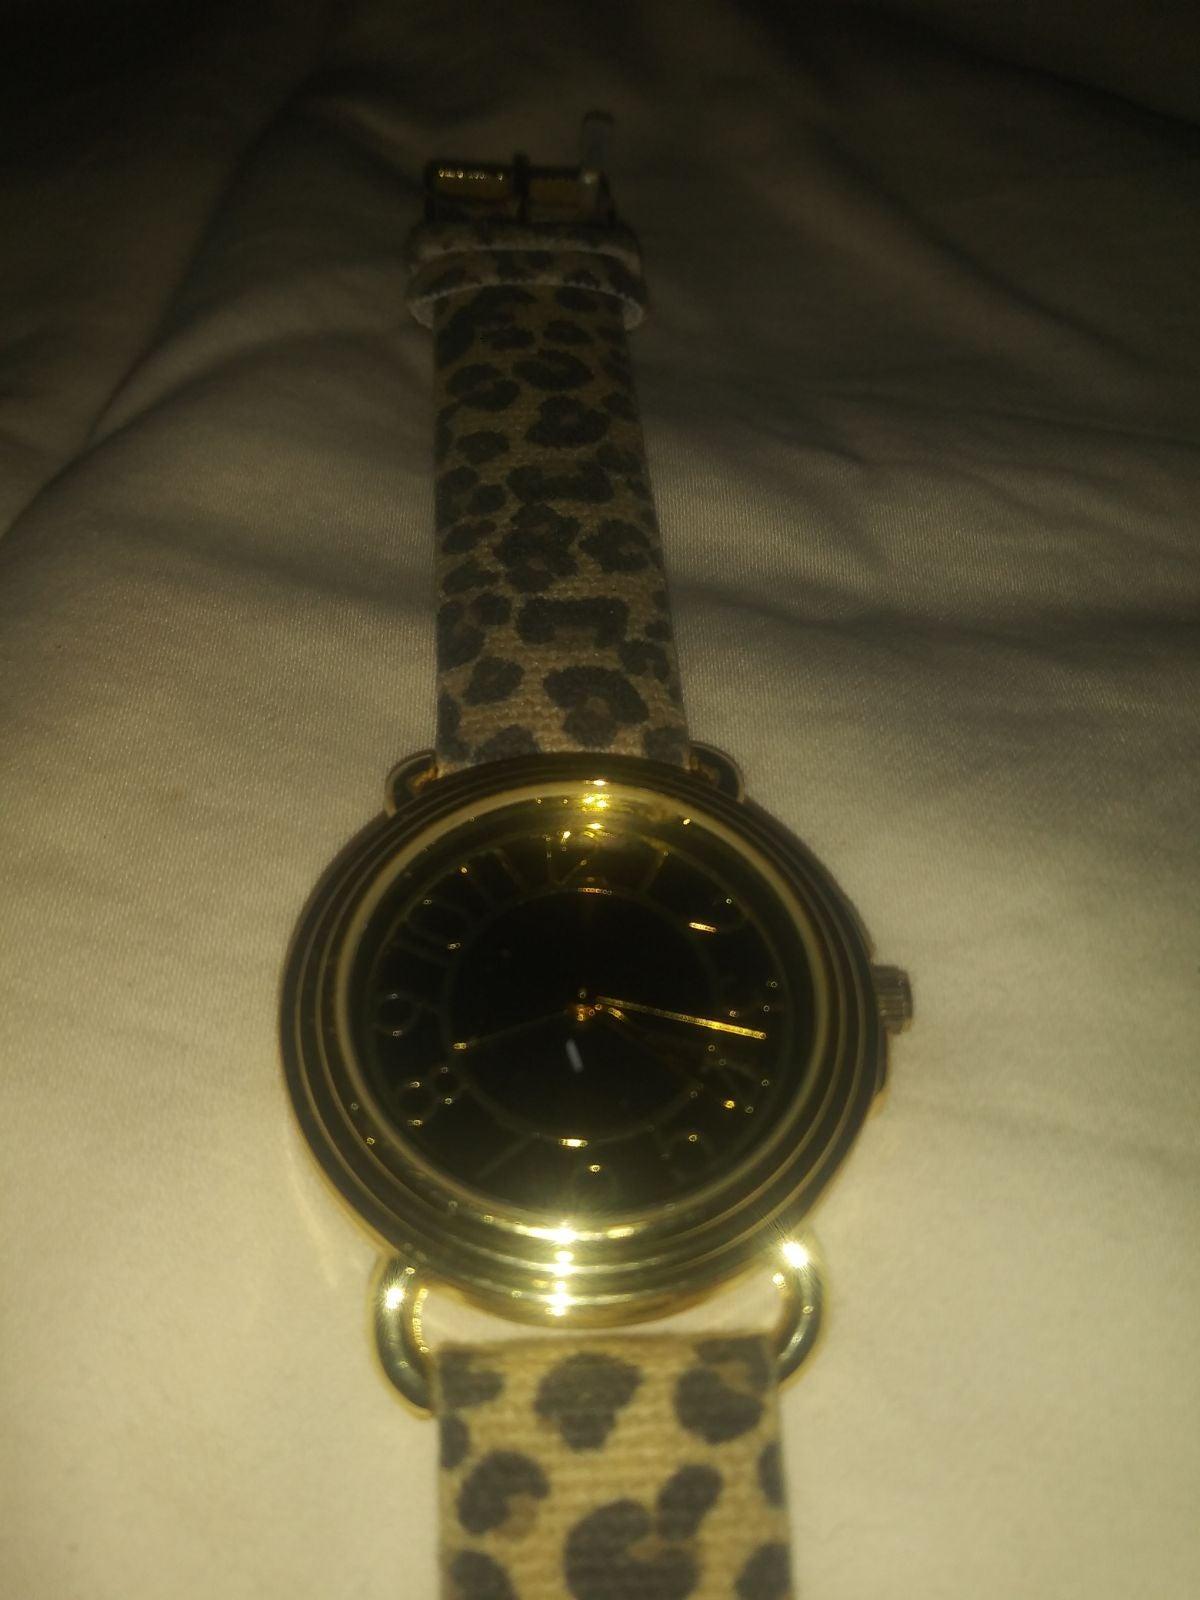 NWOT gold tone/animal print watch #19